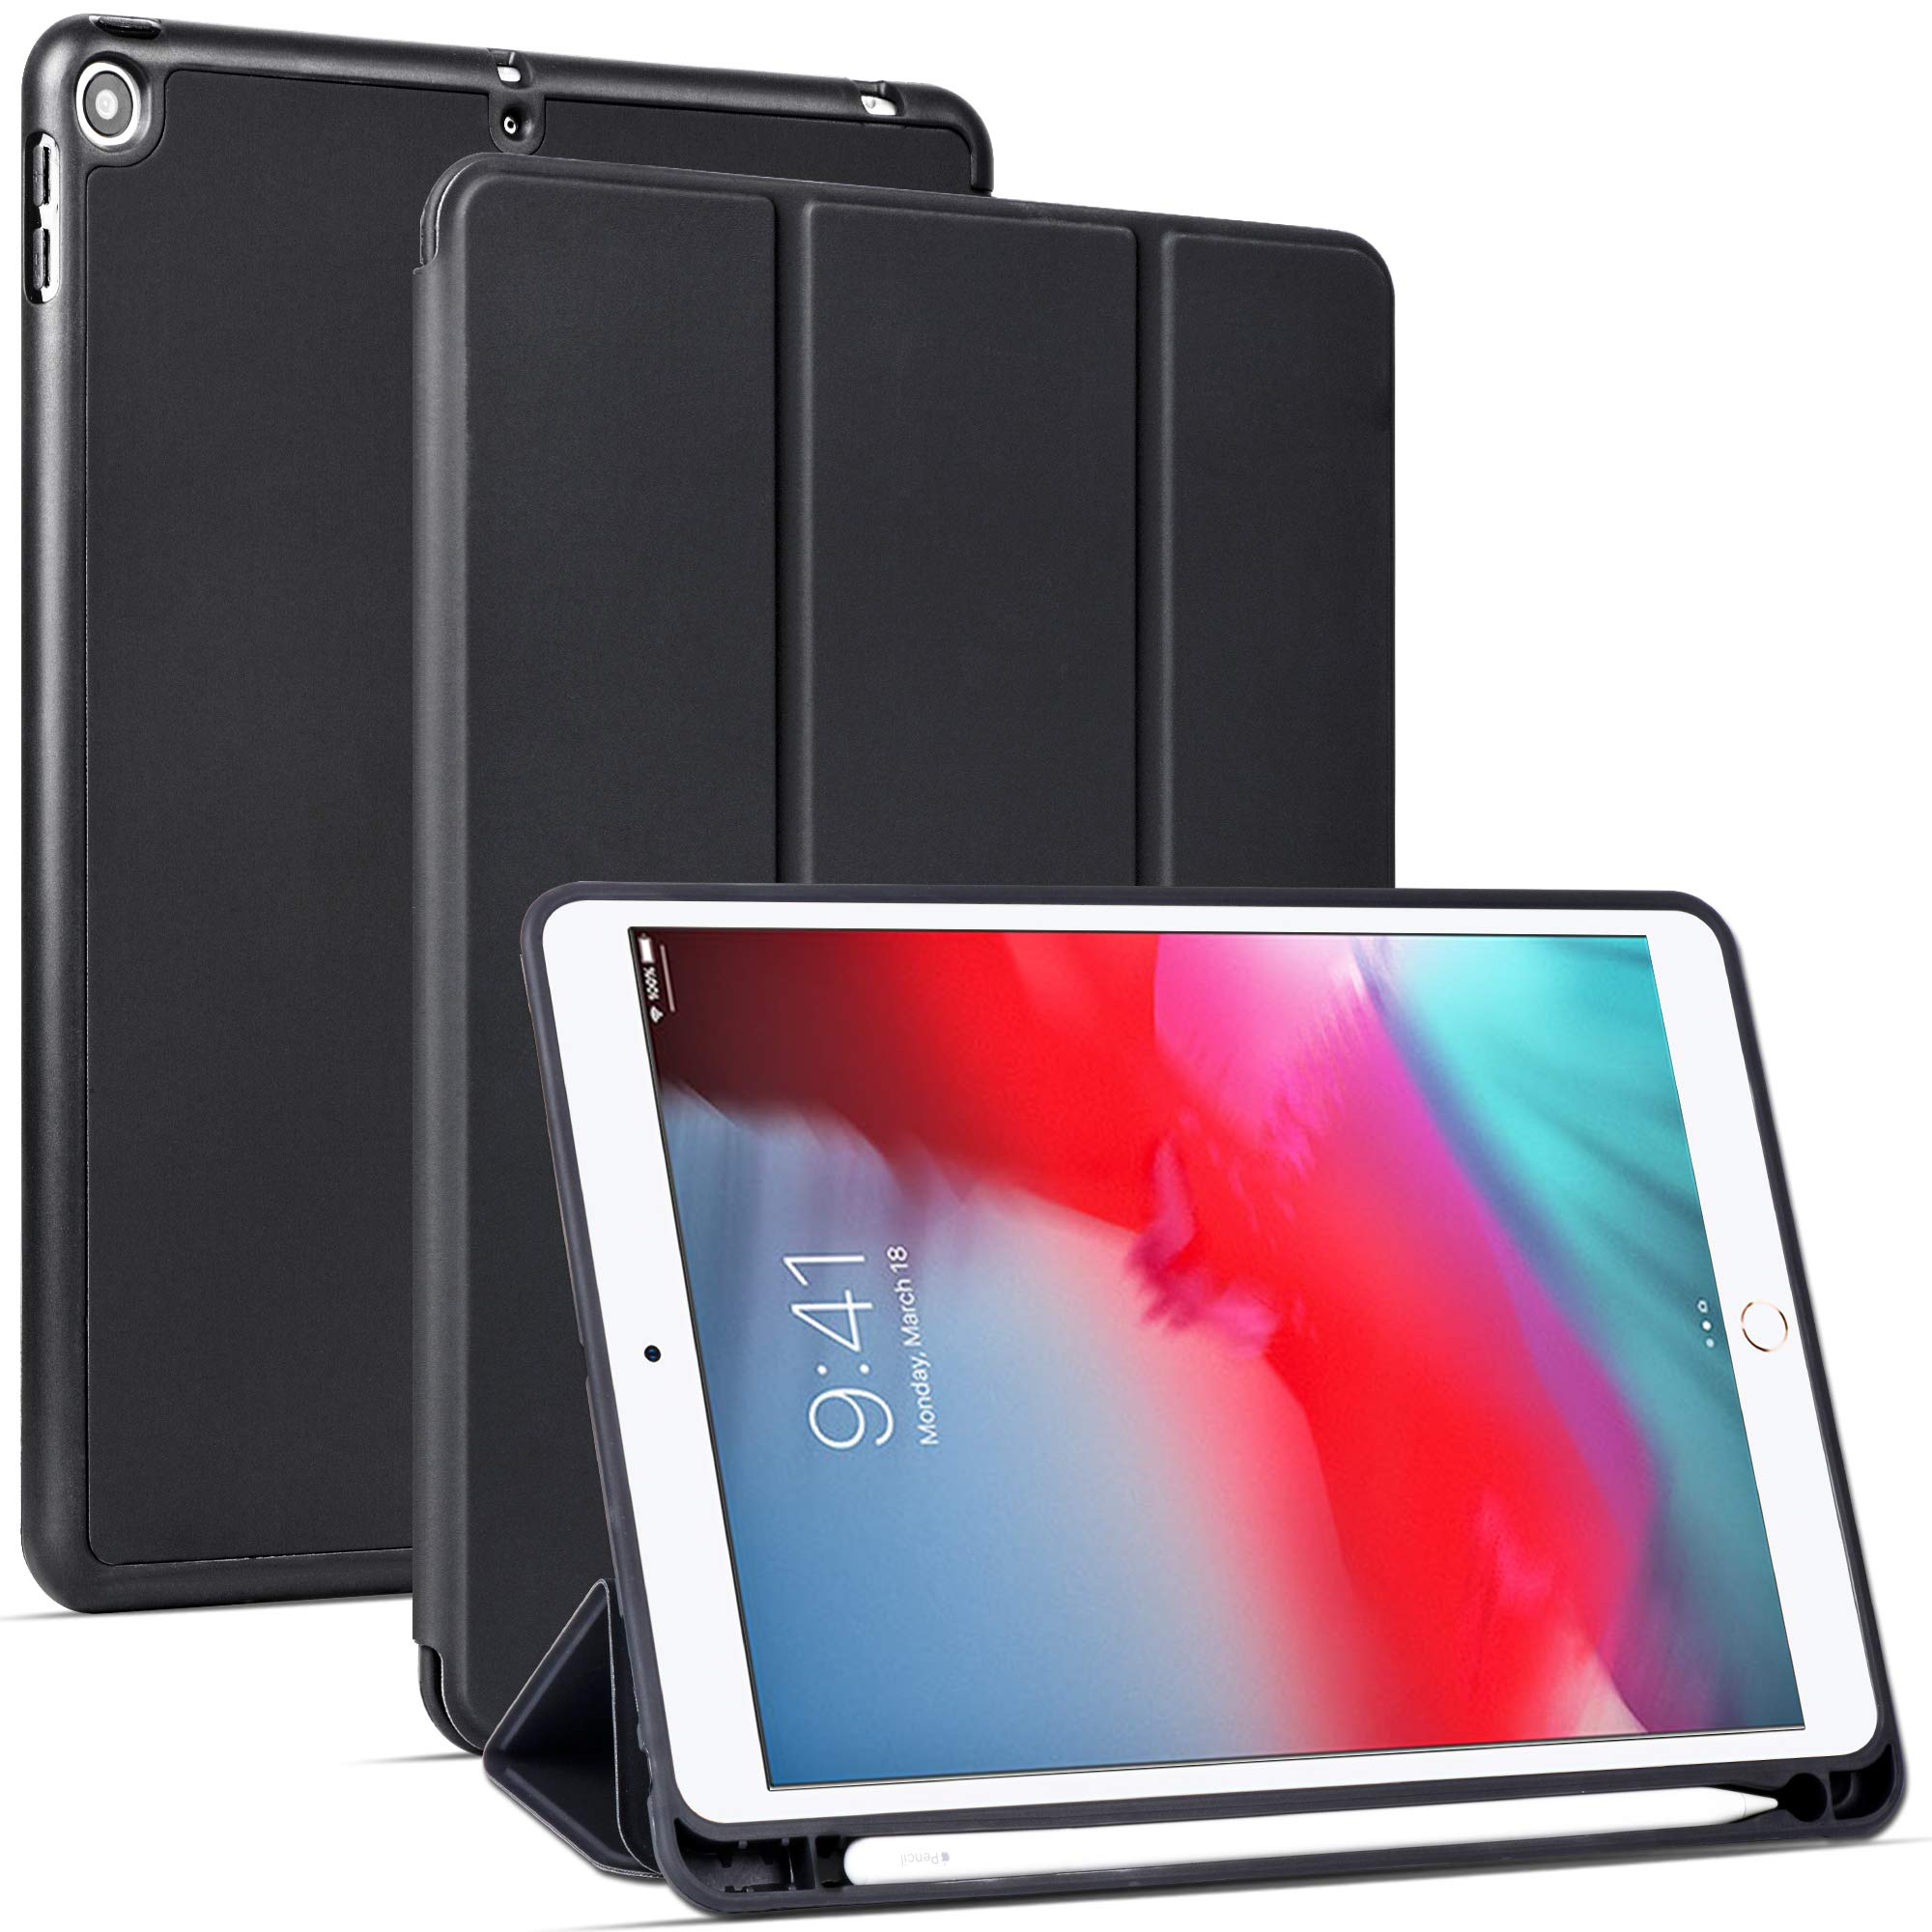 Arae Case for iPad Mini 5 - Flip Folio [Kickstand Feature] PU Leather Wallet case Cover with auto Sleep/Awake Function - Black